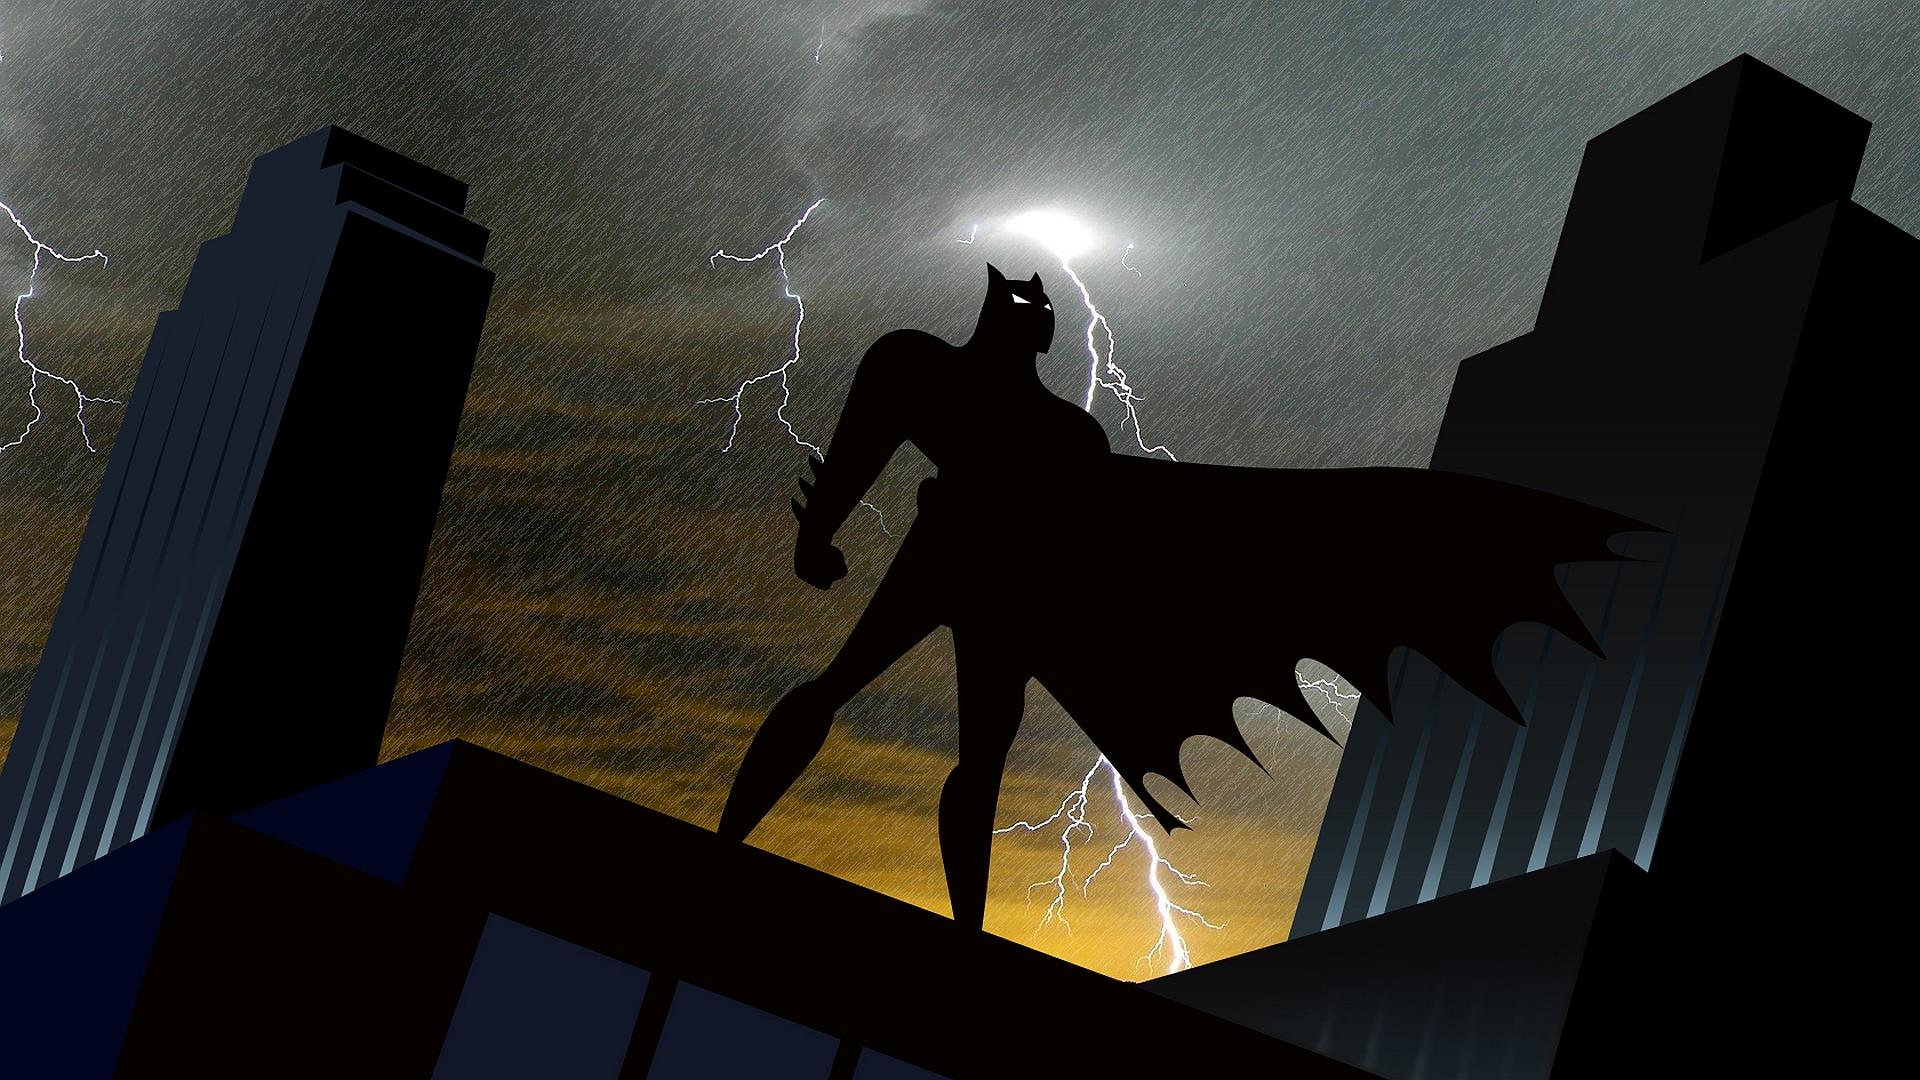 75 Batman Cartoon Wallpaper On Wallpapersafari